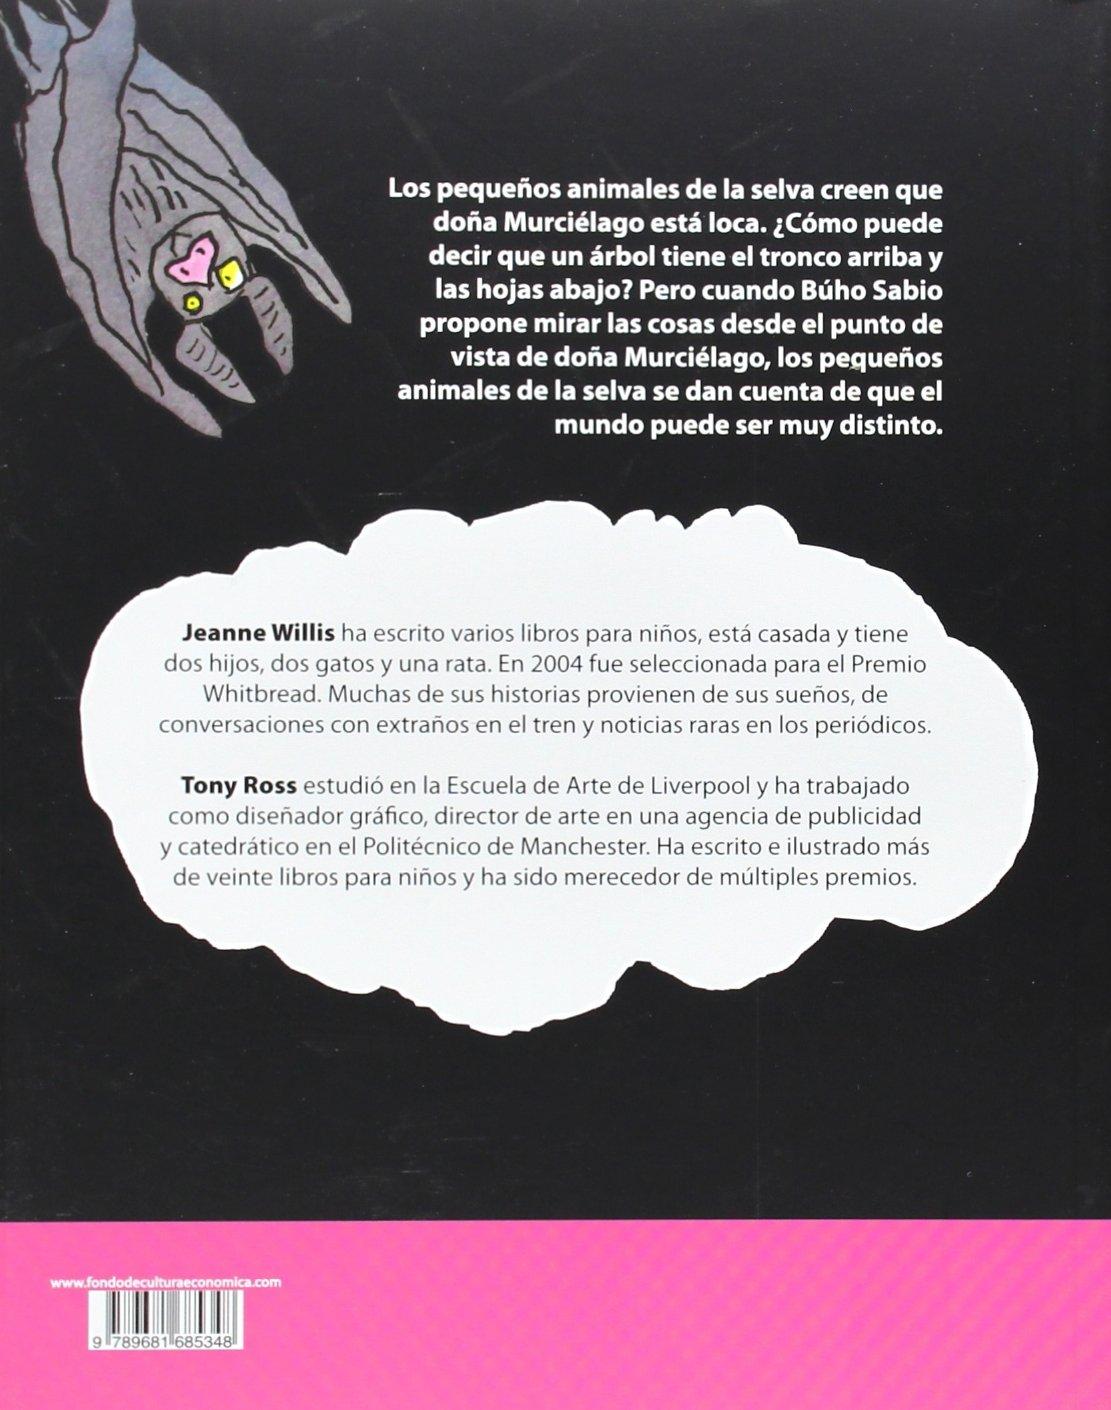 Amazon.com: ¡Ves al revés! (Primerisimos) (Spanish Edition) (9789681685348): Willis Jeanne: Books